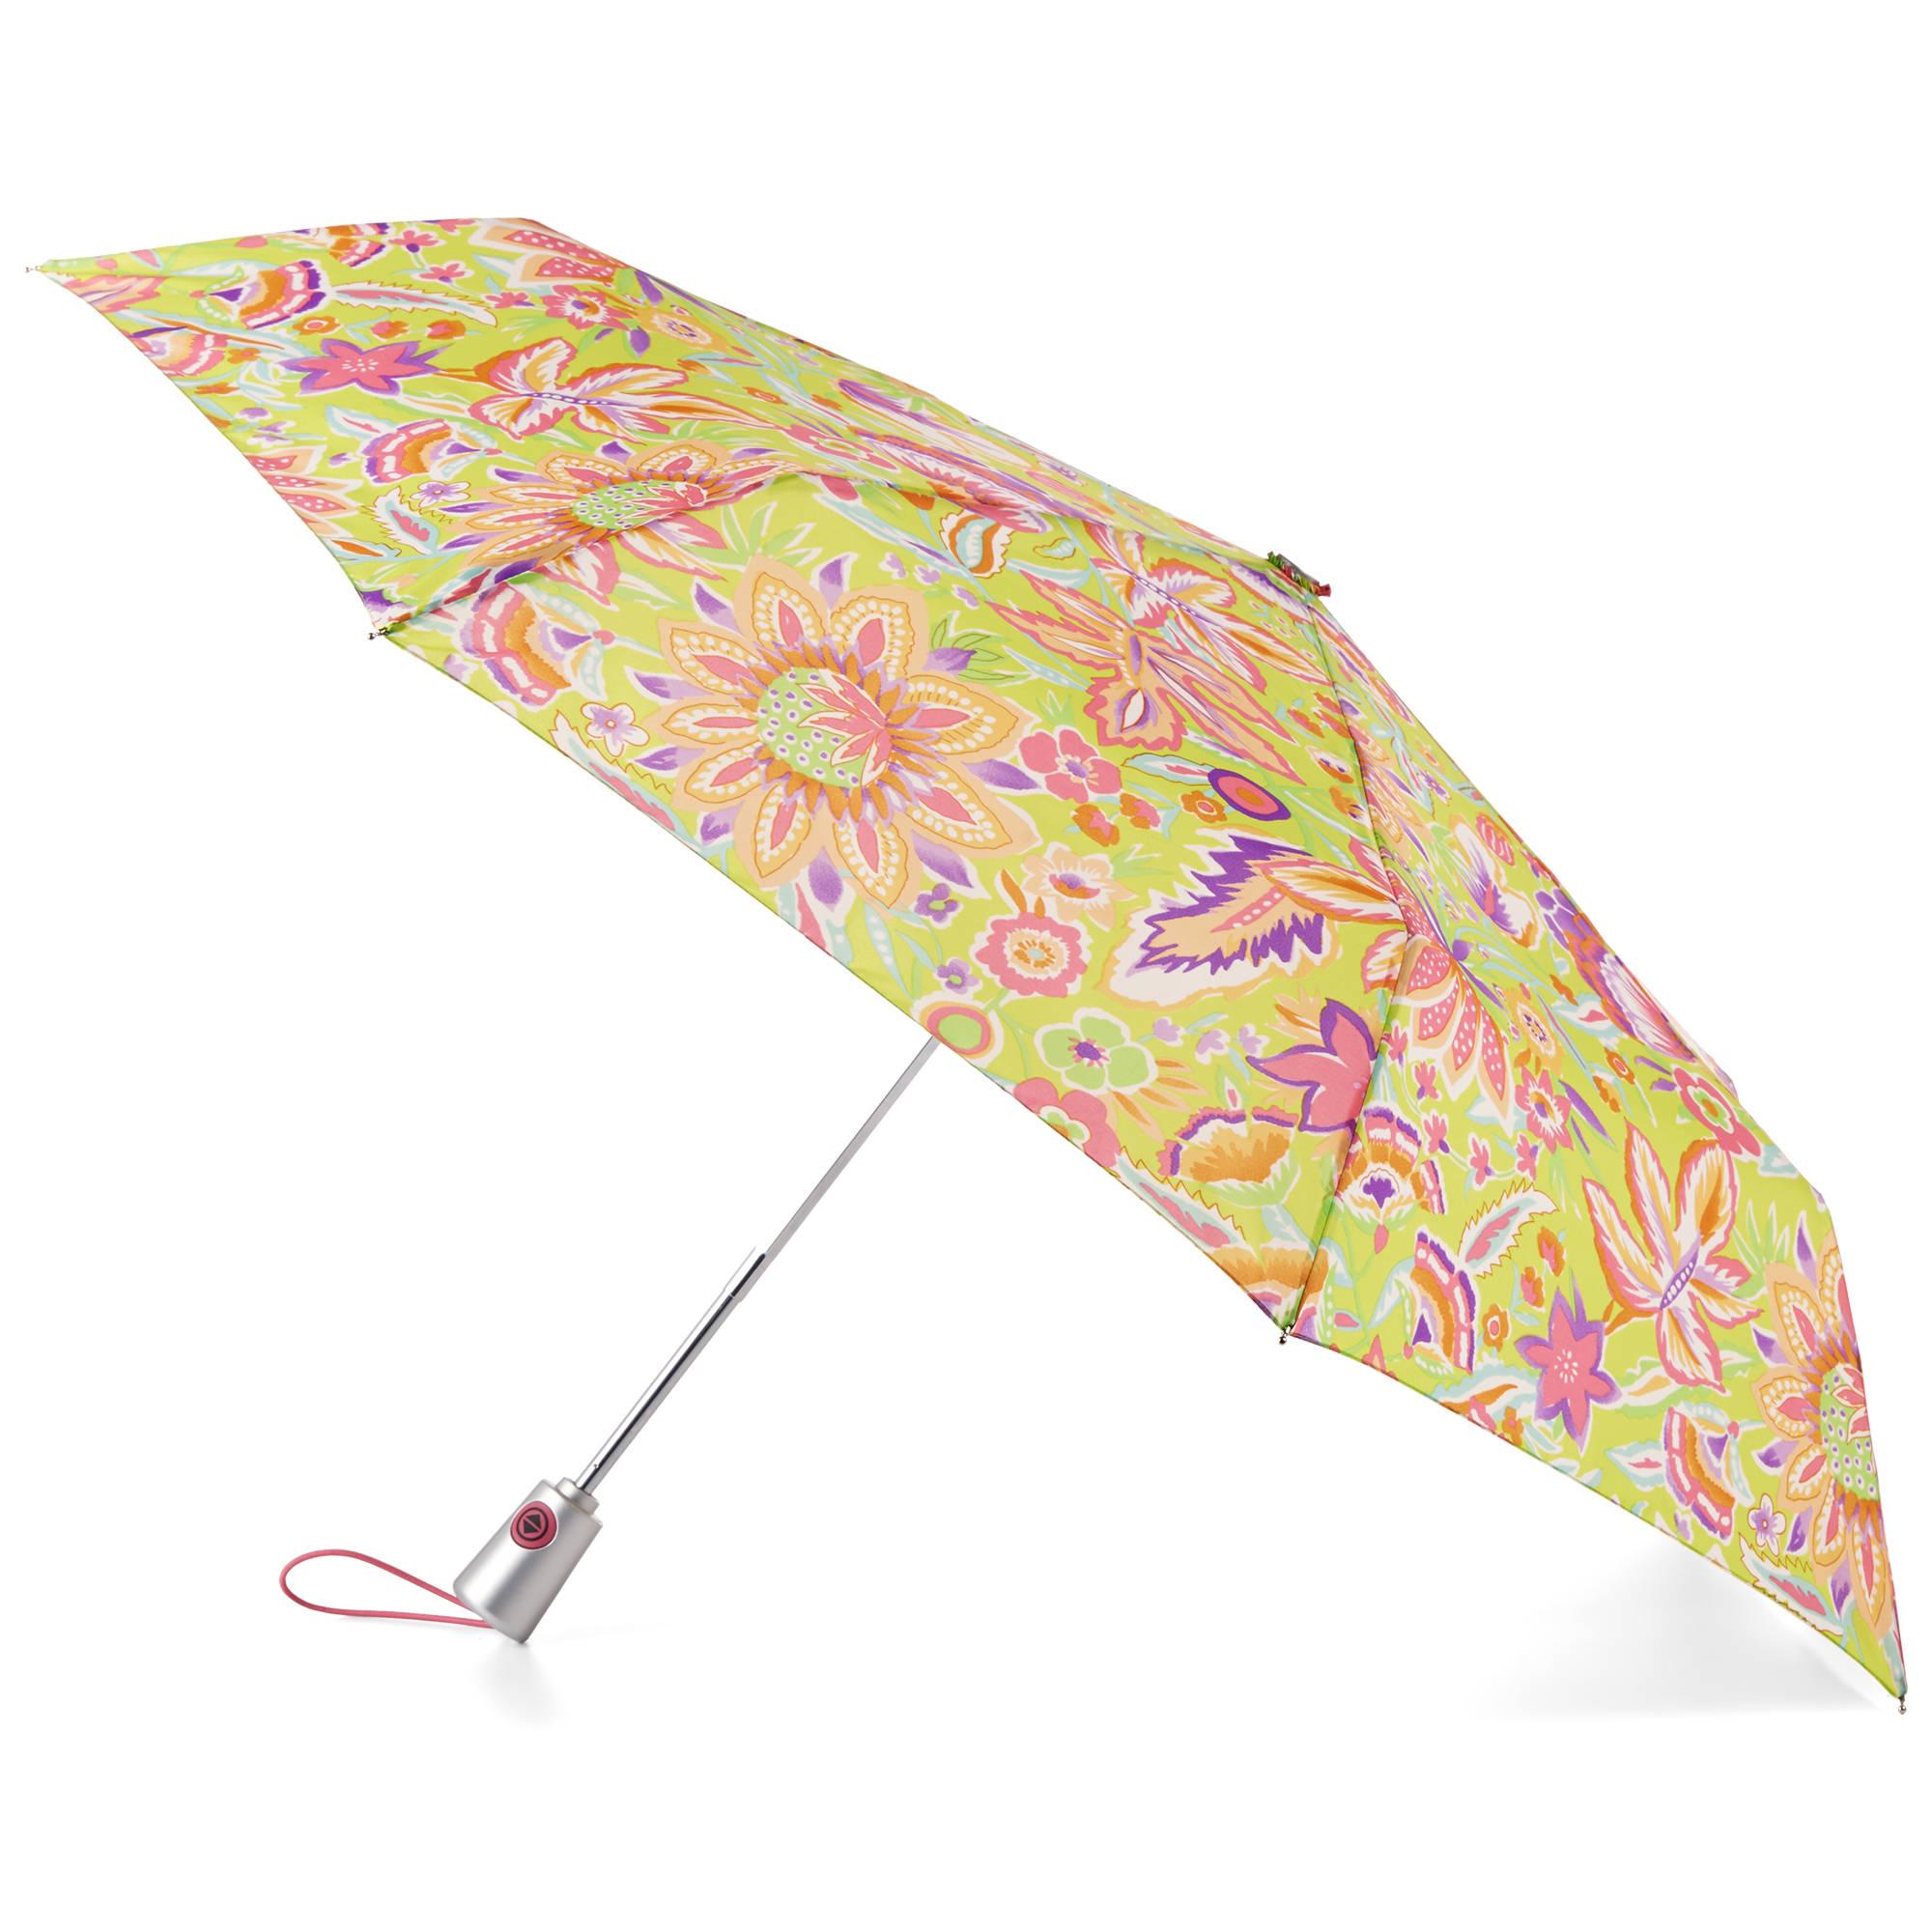 e9db8e3baad5 Totes Auto Open Close Umbrella with NeverWet - $5.99 + Free S&H ...